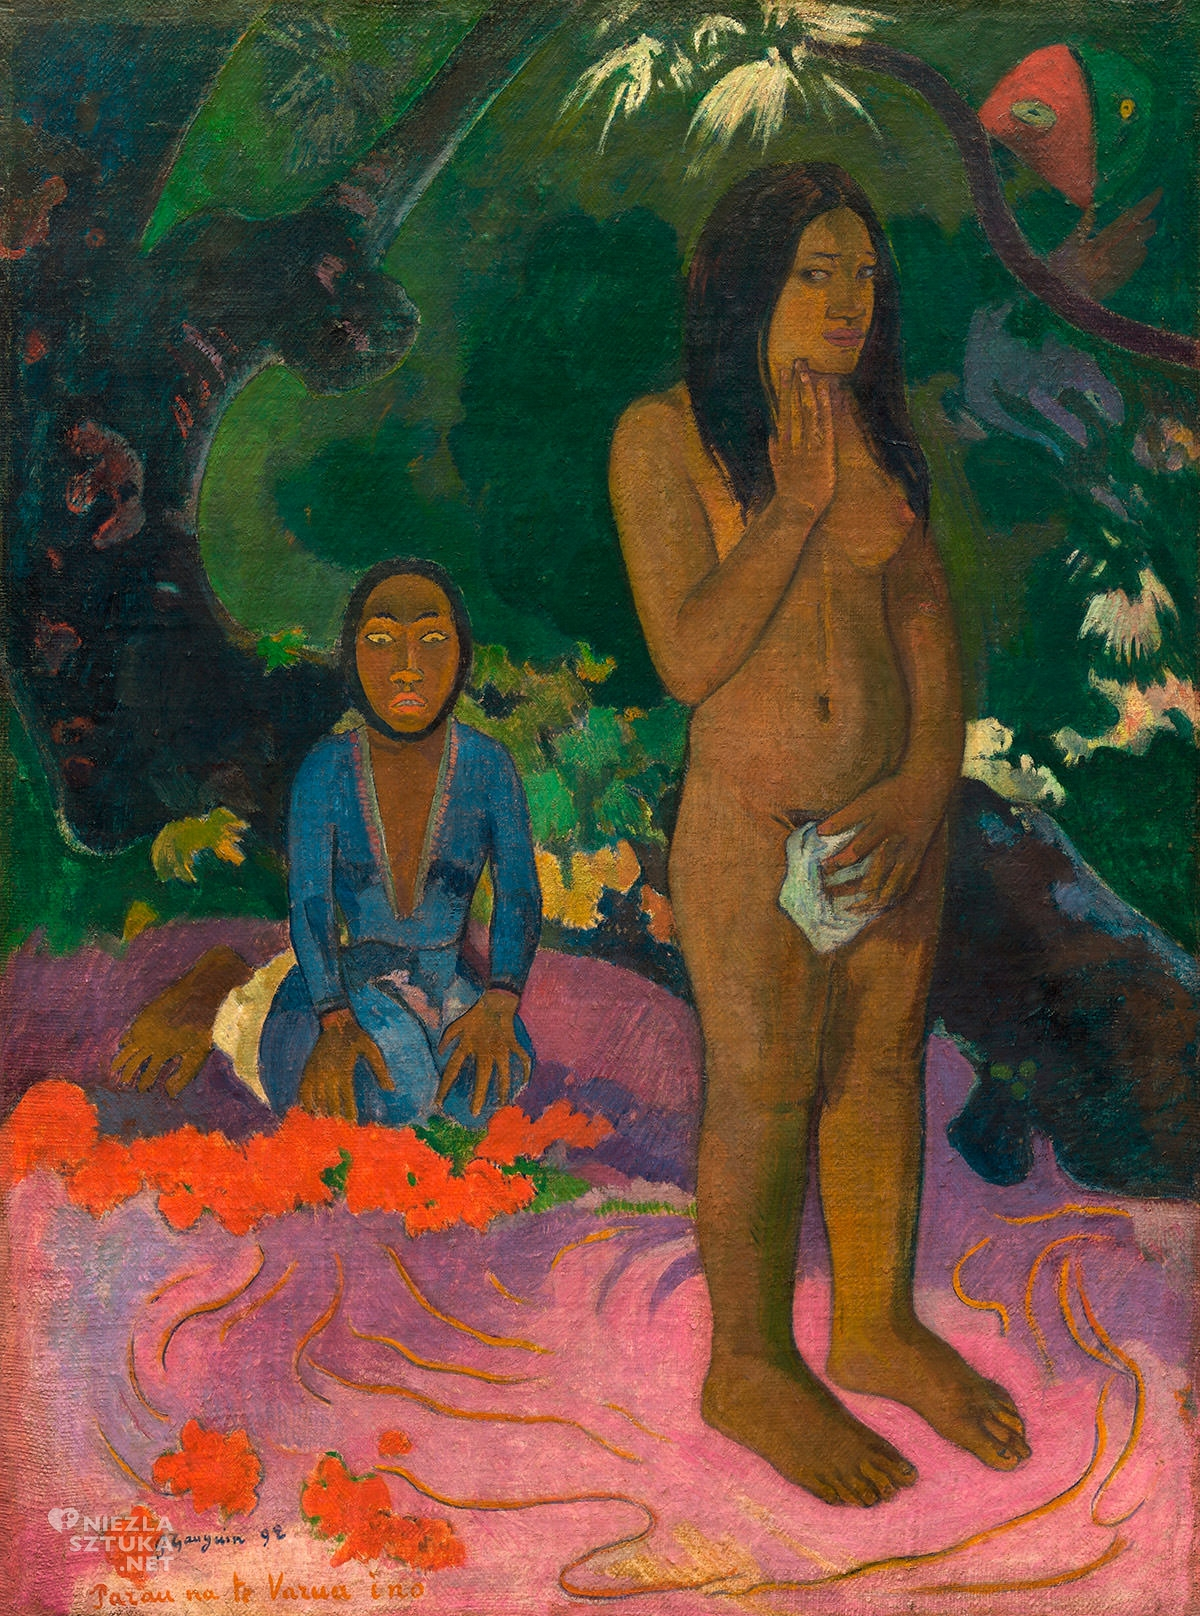 Paul Gauguin, Parau na te Varua ino, postimpresjonizm, impresjonizm, postimpresjoniści, malarstwo Tahiti, malarstwo Polinezji, podróże Gauguina, Niezła Sztuka